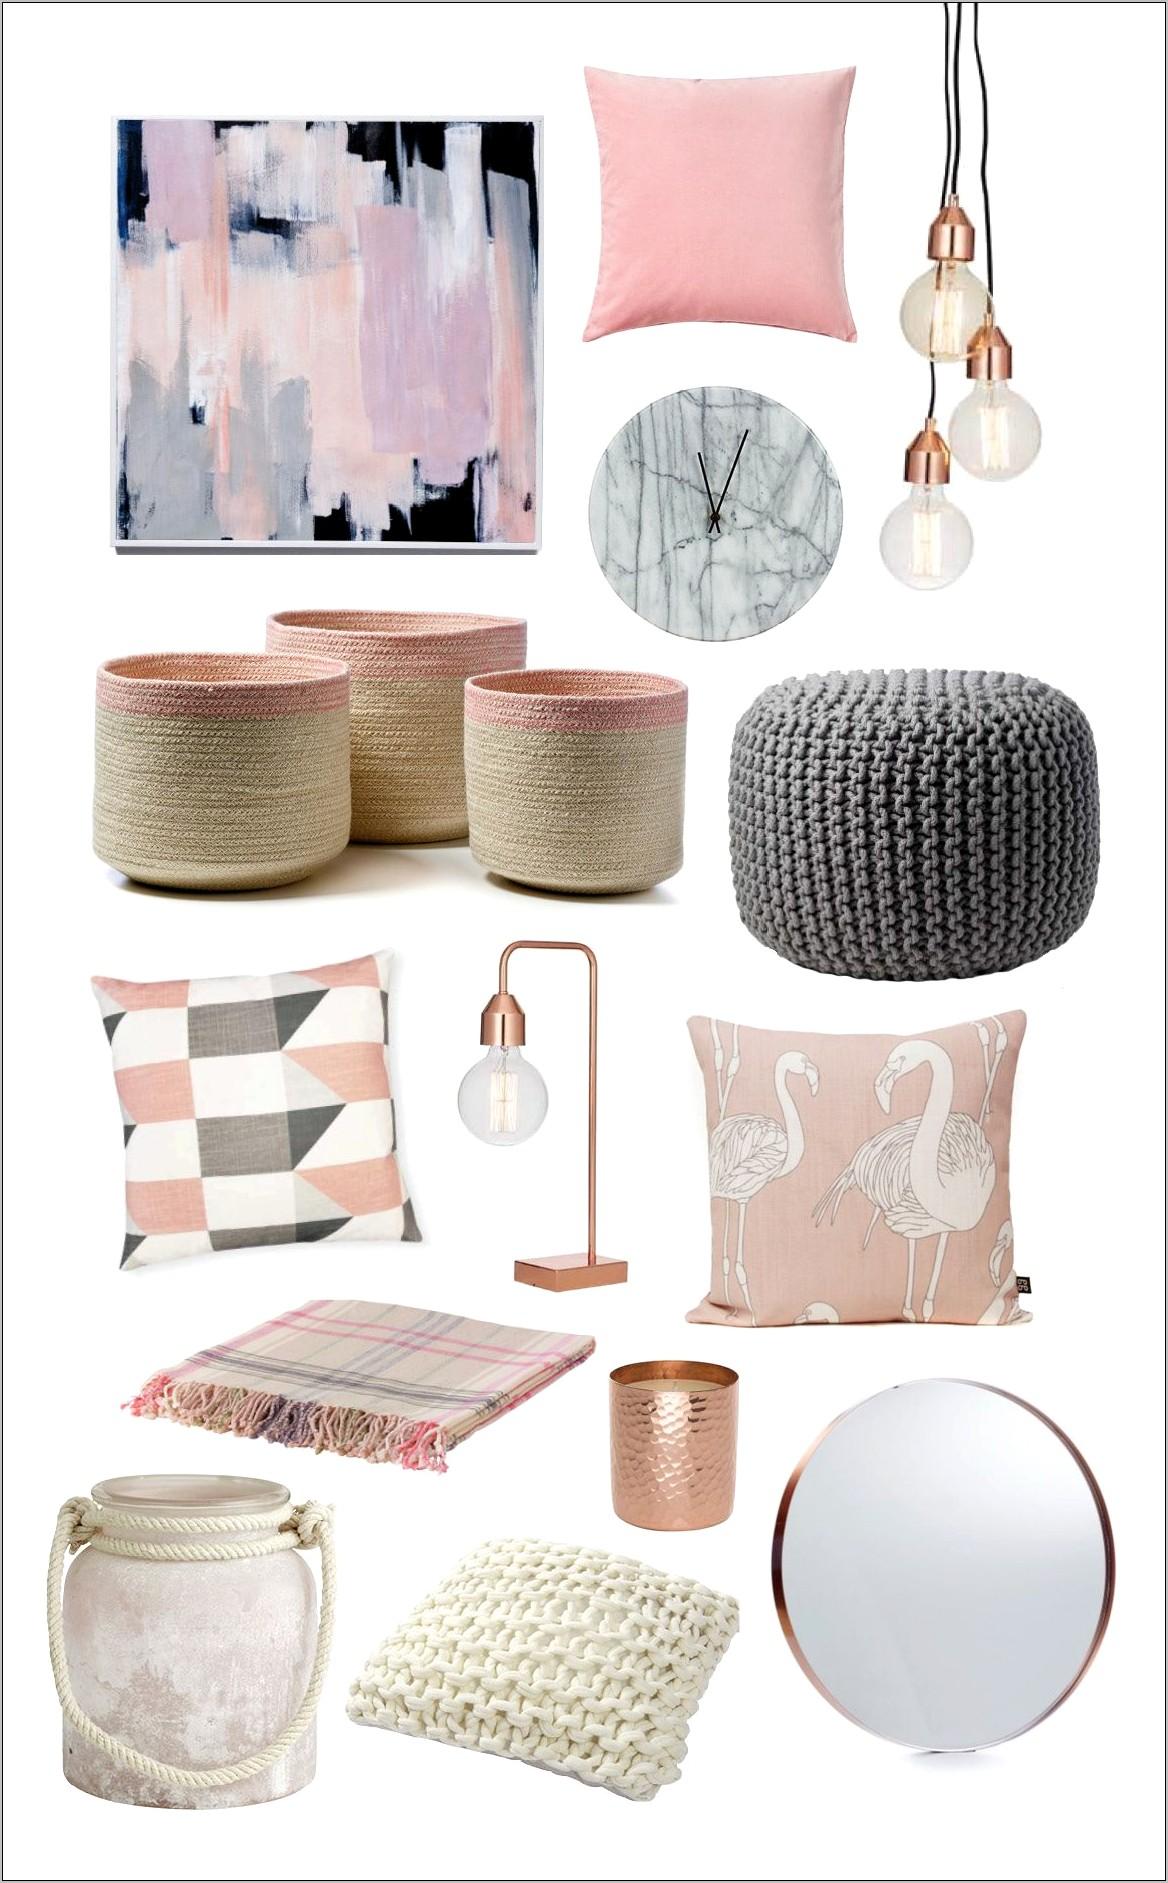 Pink Kitchen Decor Items